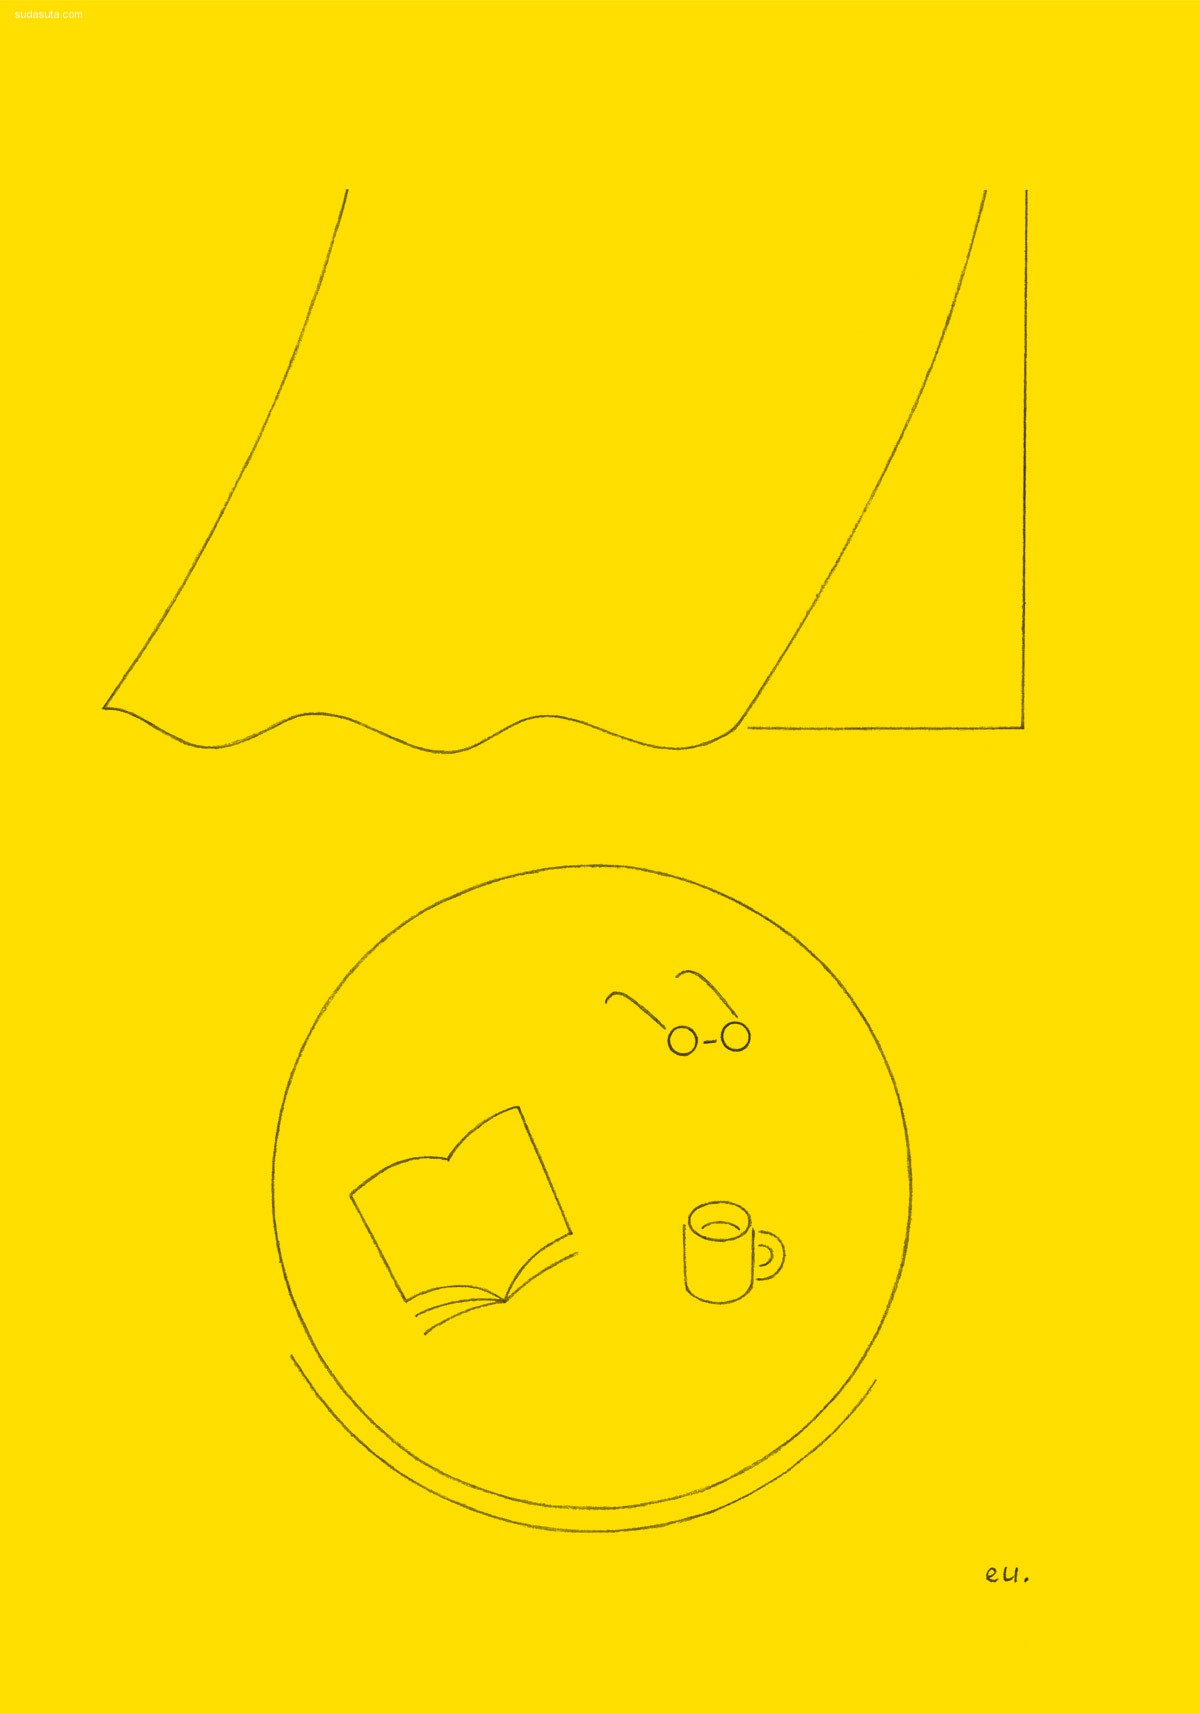 Emi Ueoka 极简主义线条插画